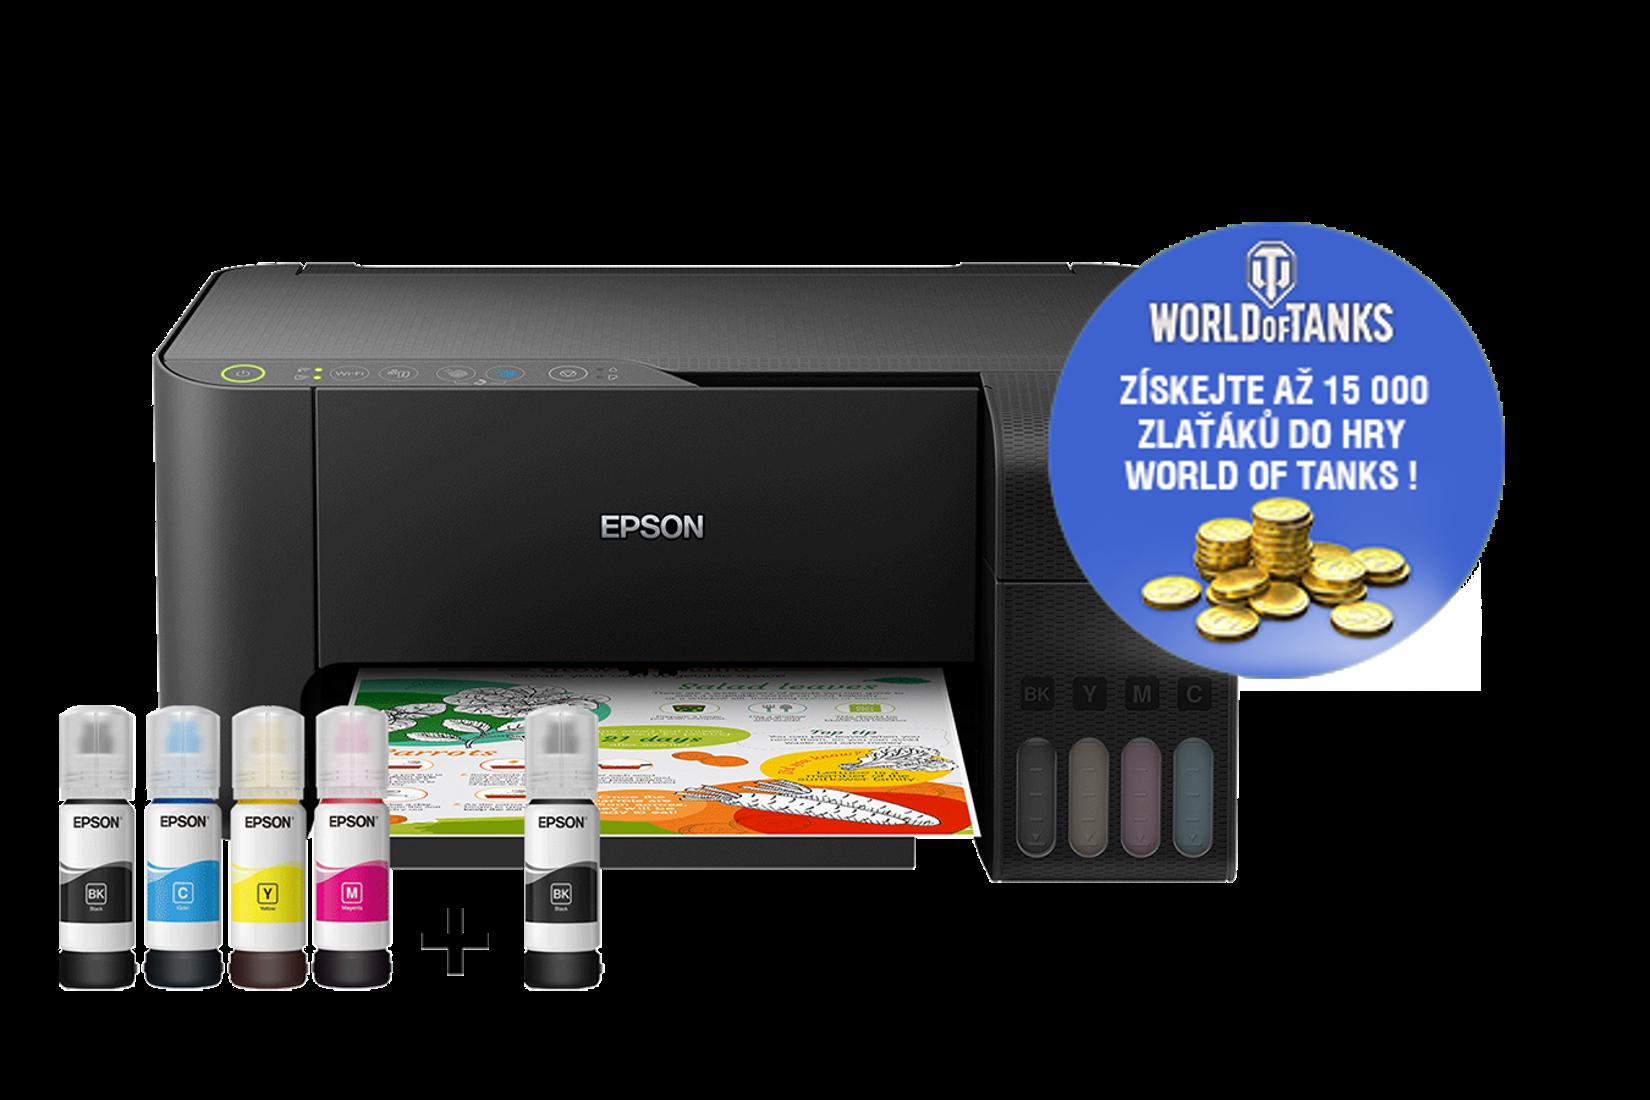 Epson L3150, A4, Wi-Fi , 33ppm, 5760 x 1440, WiFi